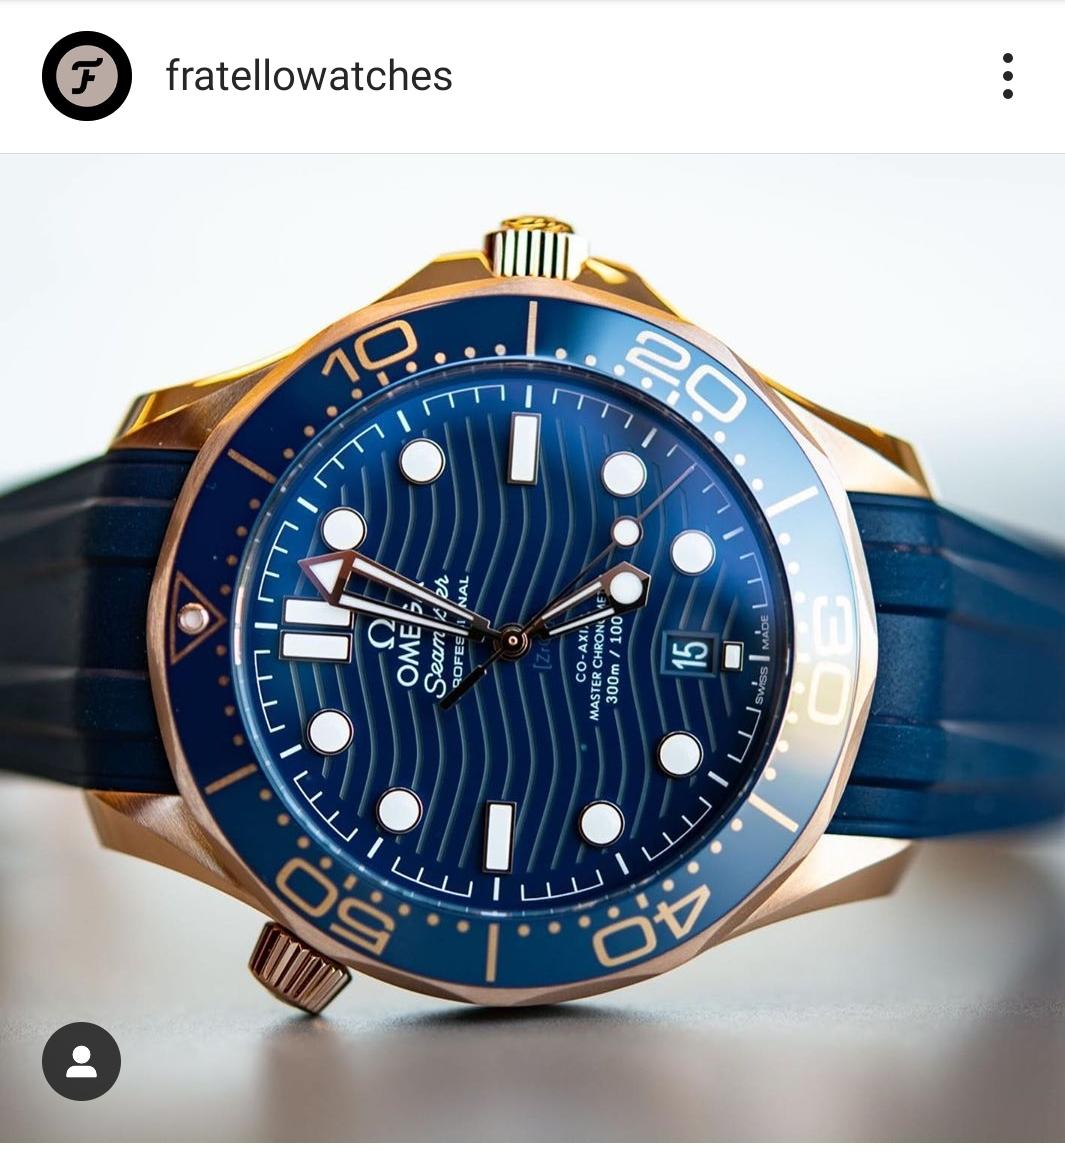 SmartSelect_20190518-001126_Instagram.